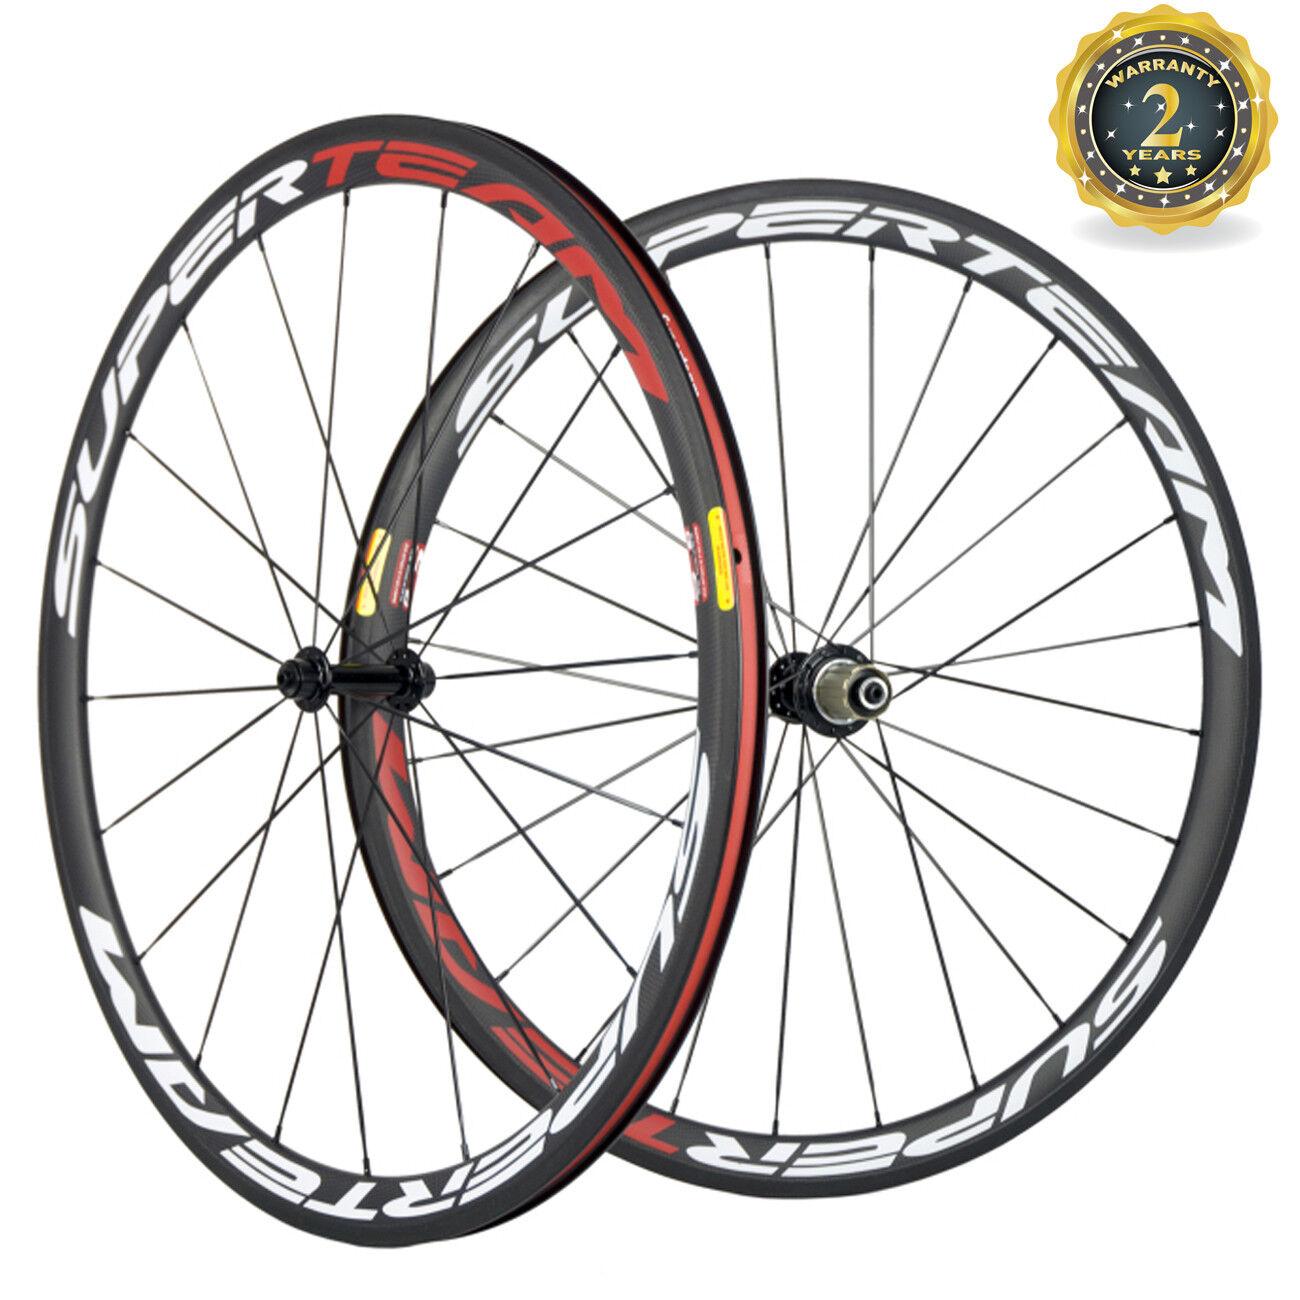 Superteam Wheels 38mm Depth Clincher Road Bike In USA Warehouse White & Red New